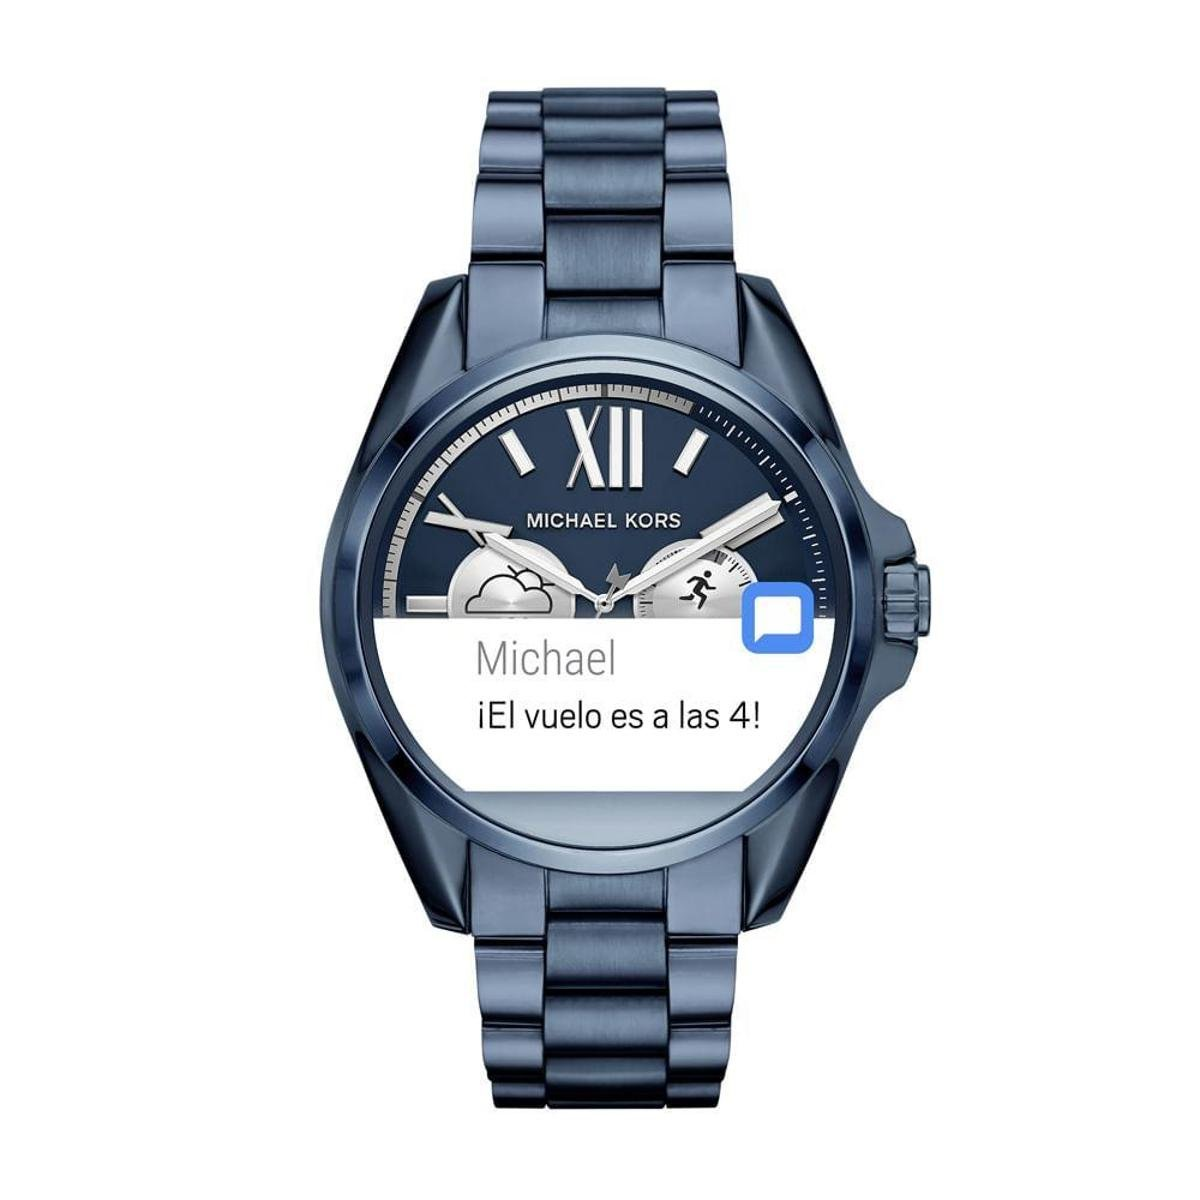 176cefa5ae447 ... Smartwatch Michael Kors Access Feminino - MKT5006 4DI MKT5006 4DI ...